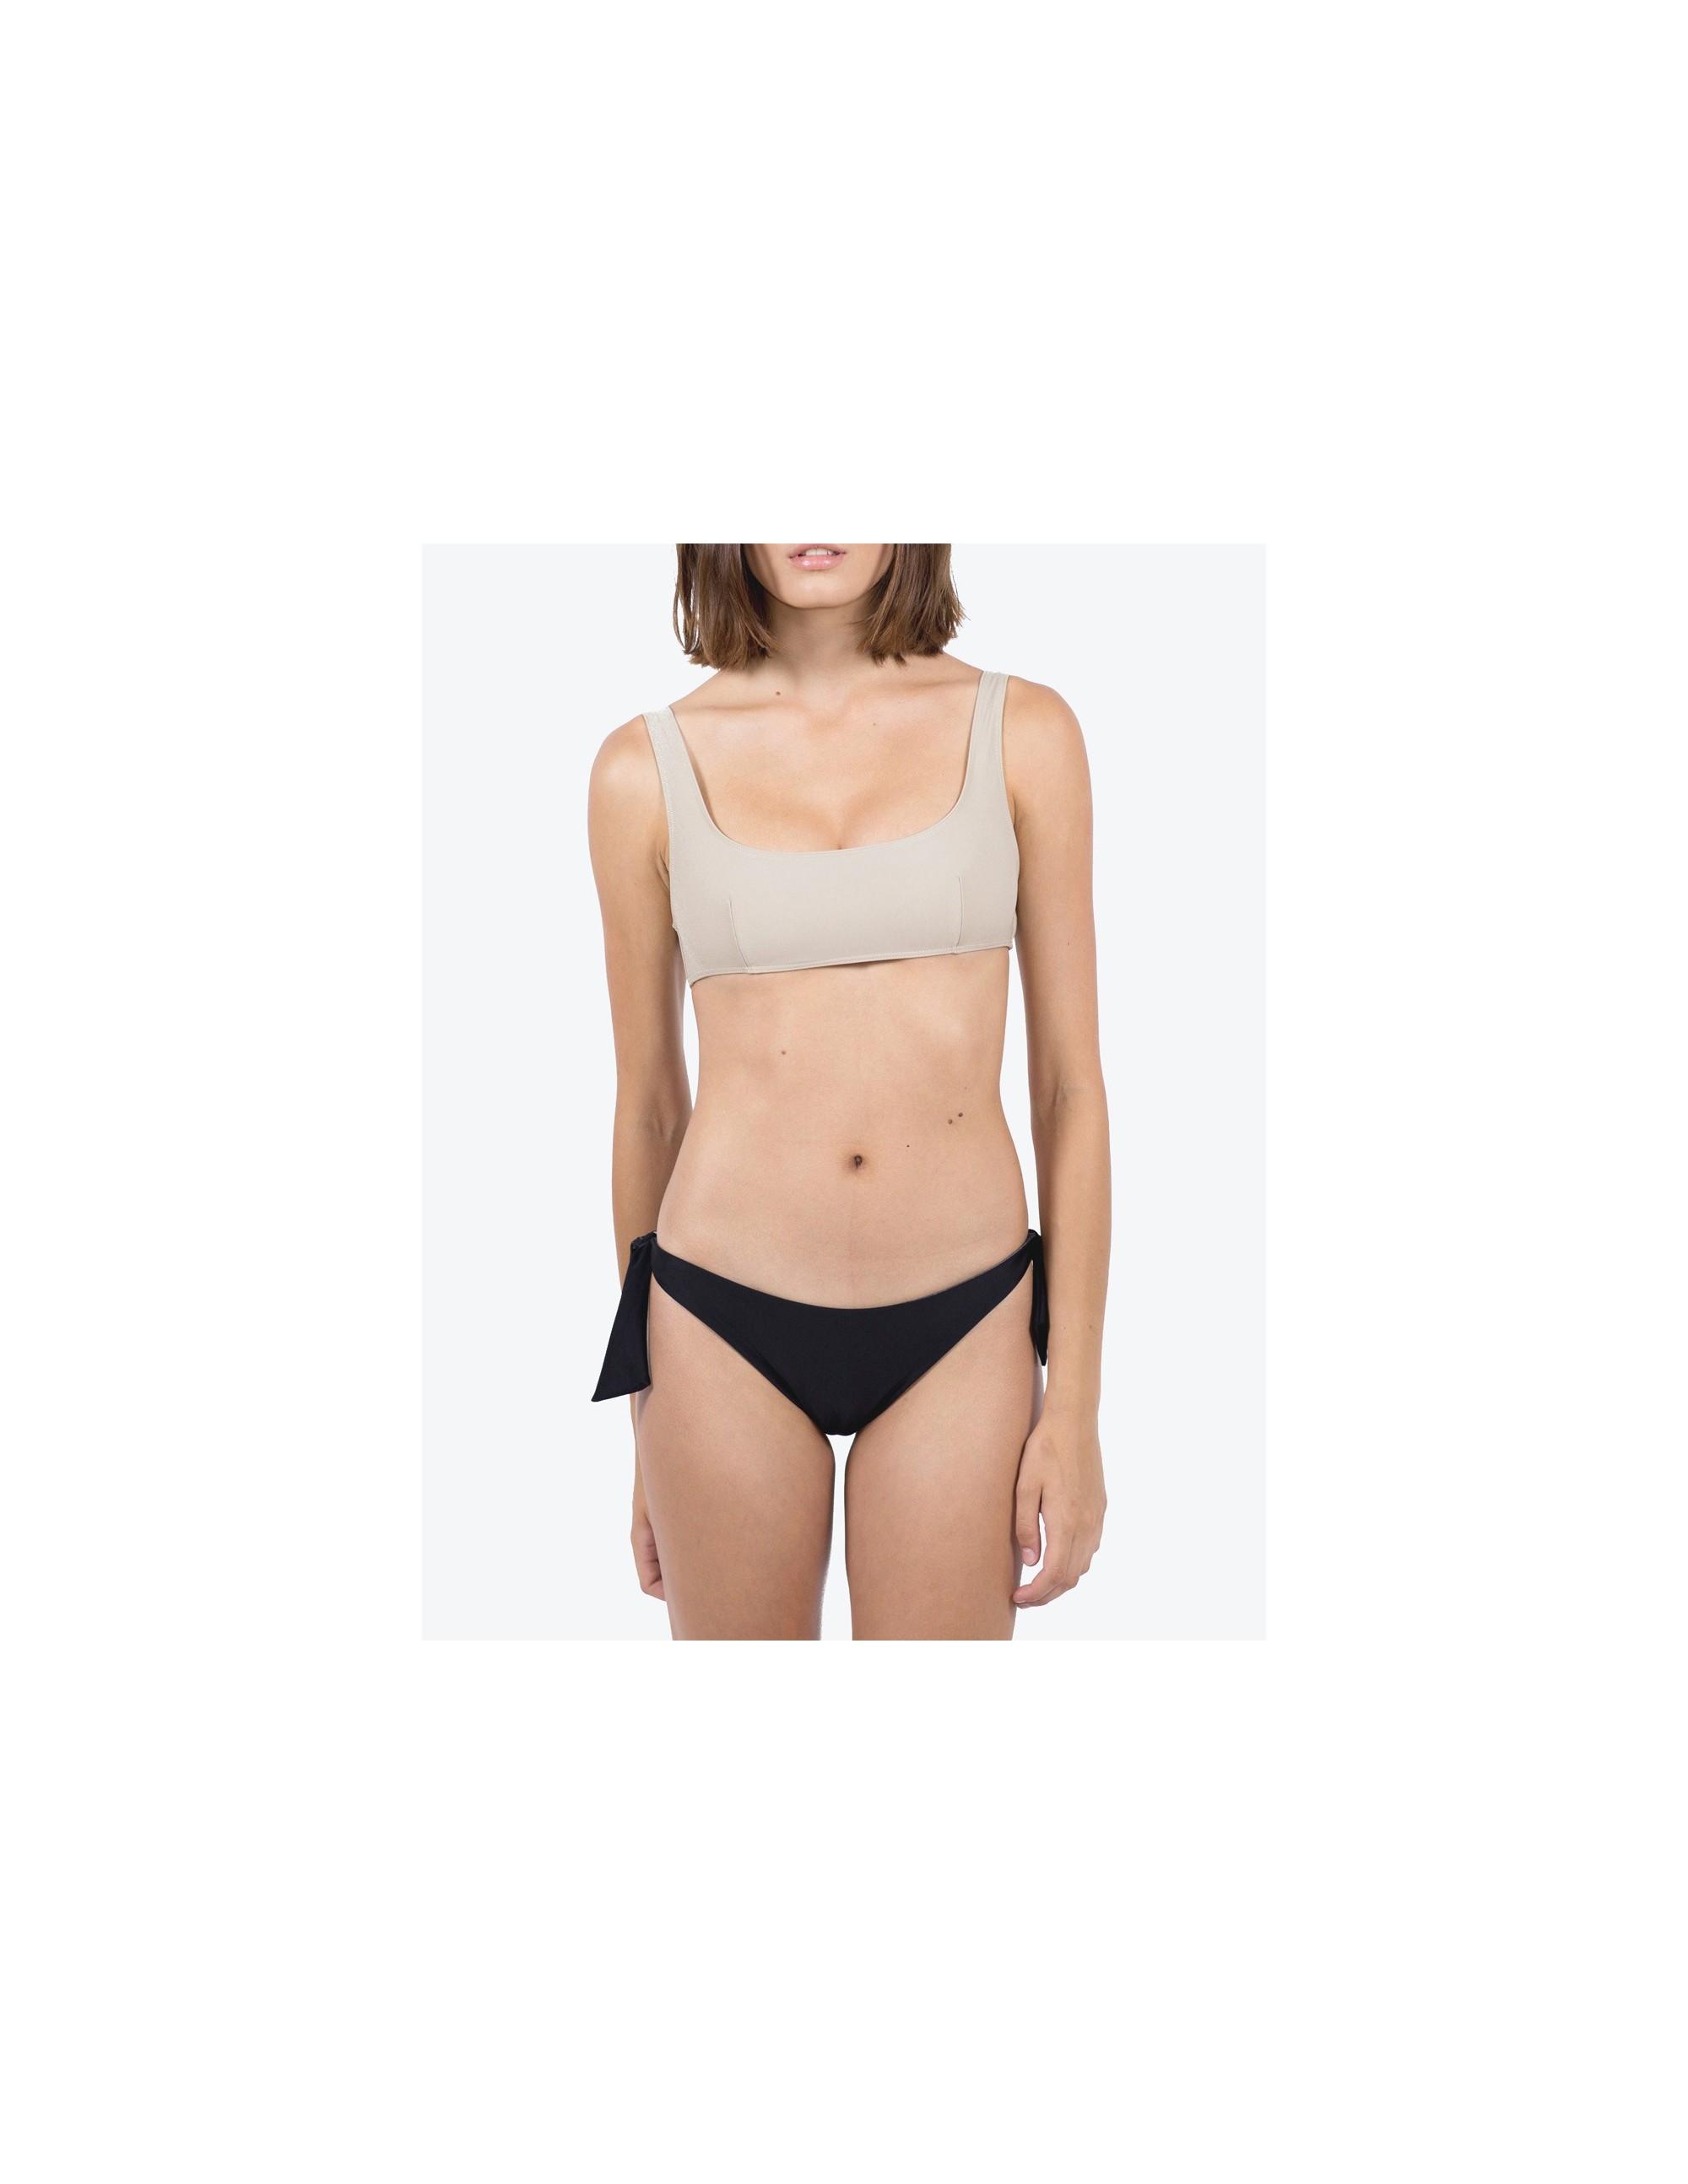 VIK bikini top - TANNED